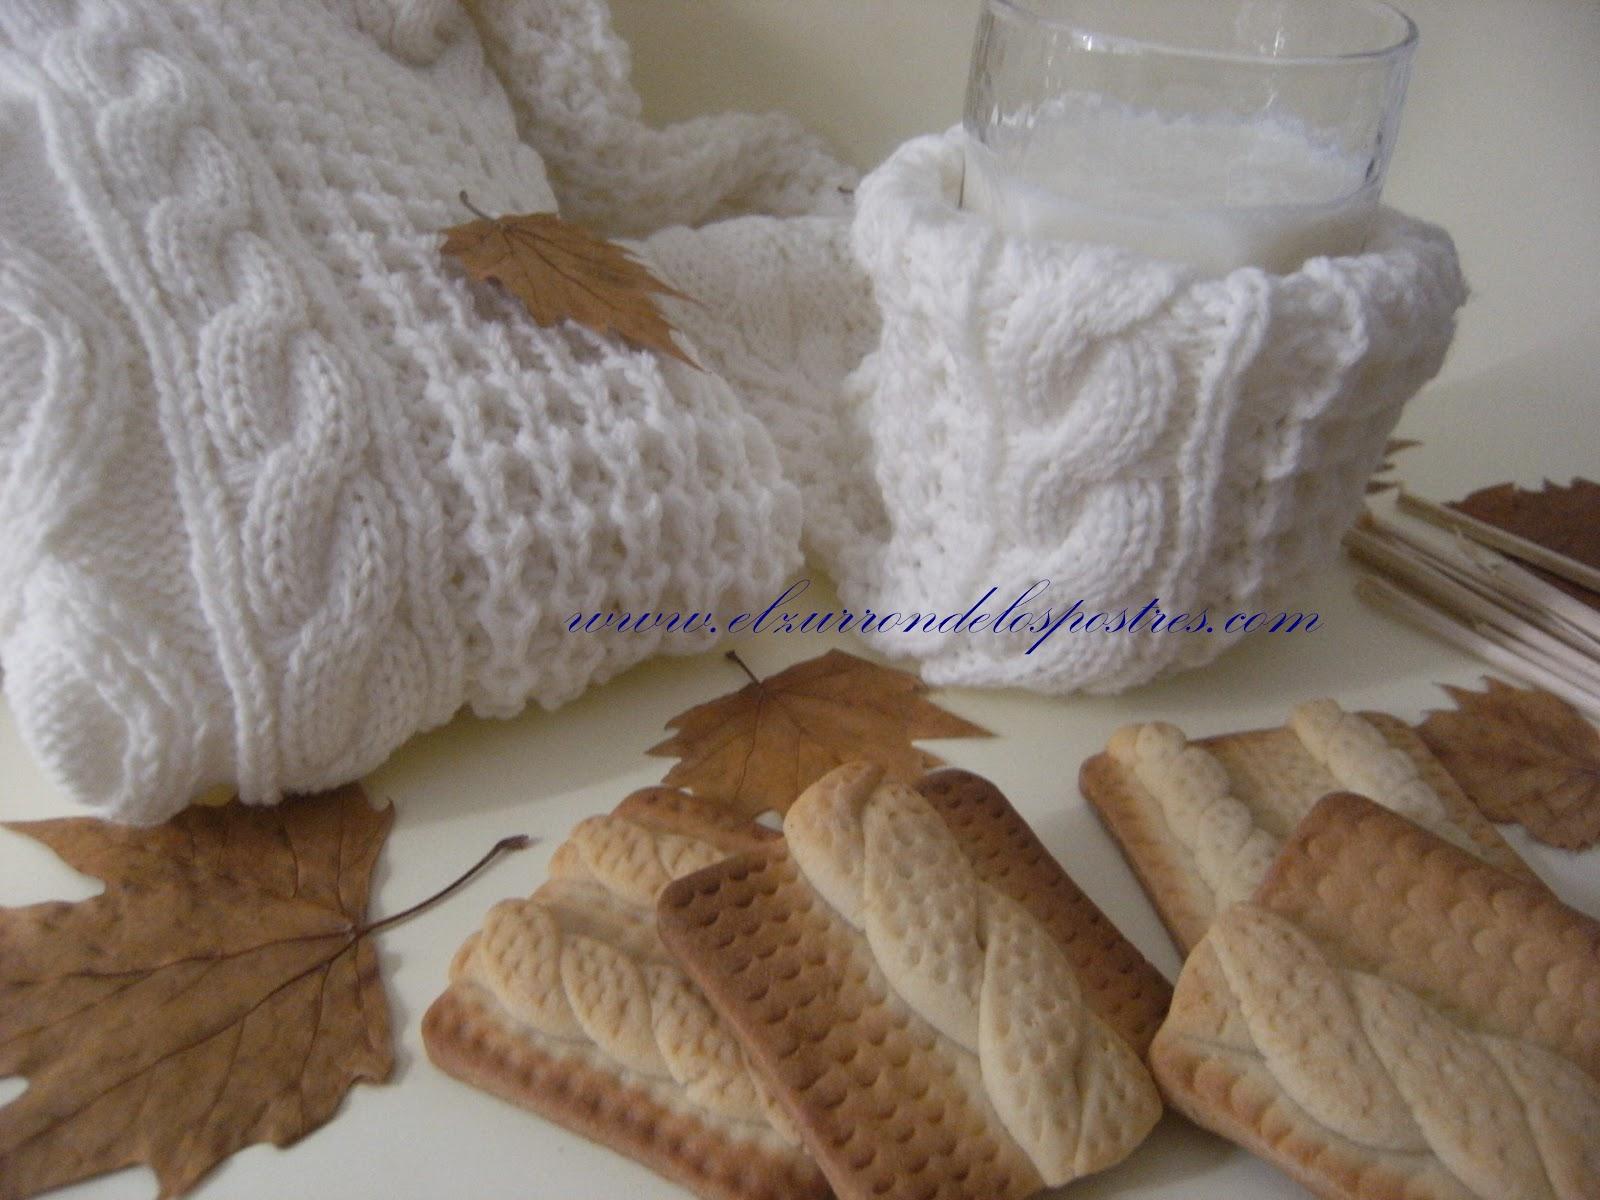 Galletas punto de lana recetas de cocina - Puntos de lana ...